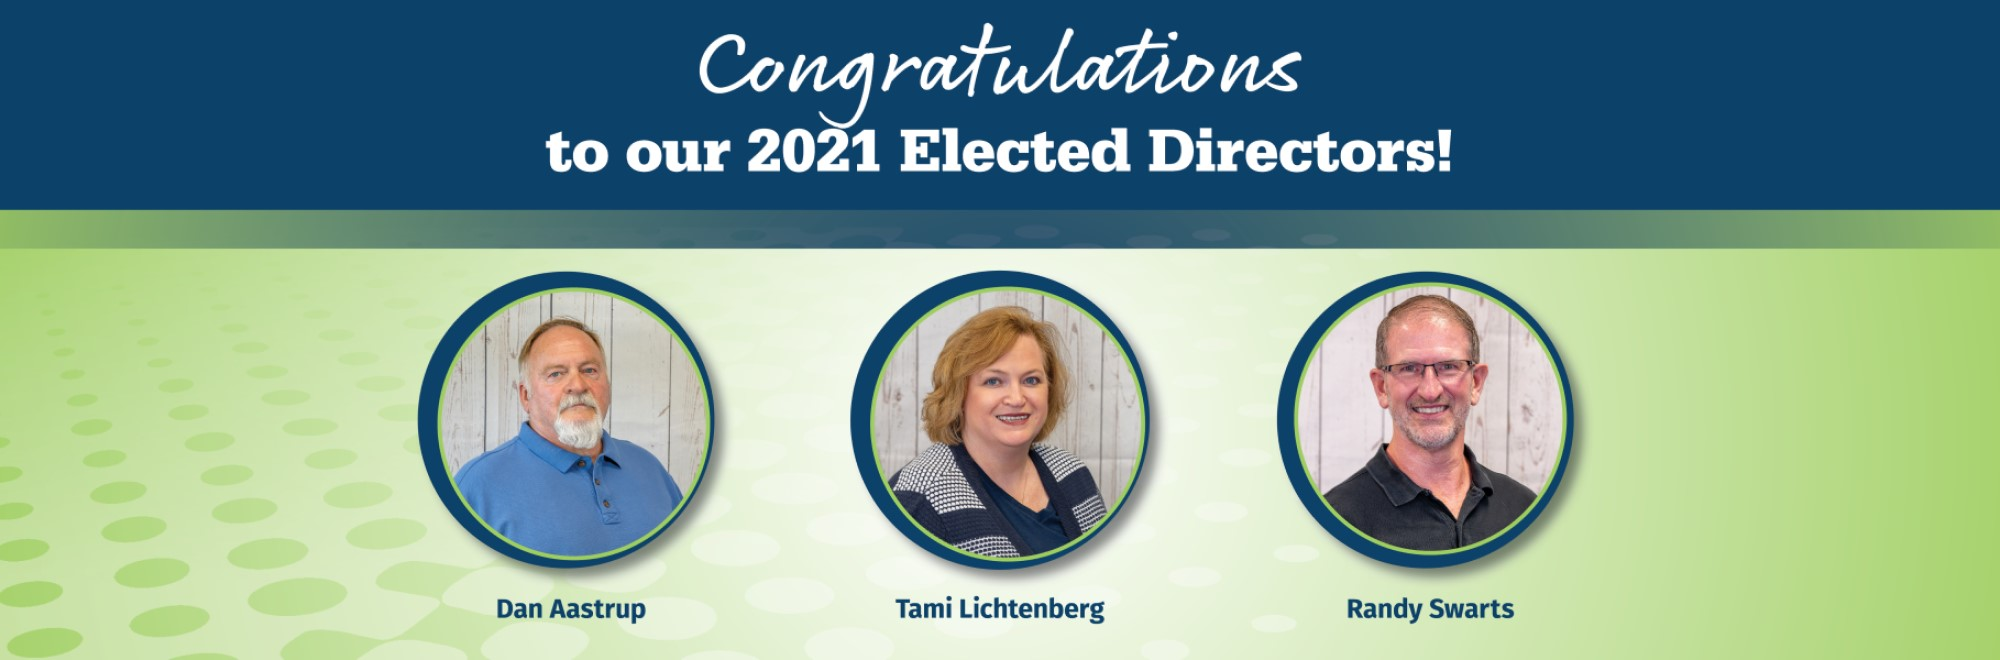 Congratulations to our 2021 Elected Directors! Dan Aastrup, Tami Lichtenberg & Randy Swarts.